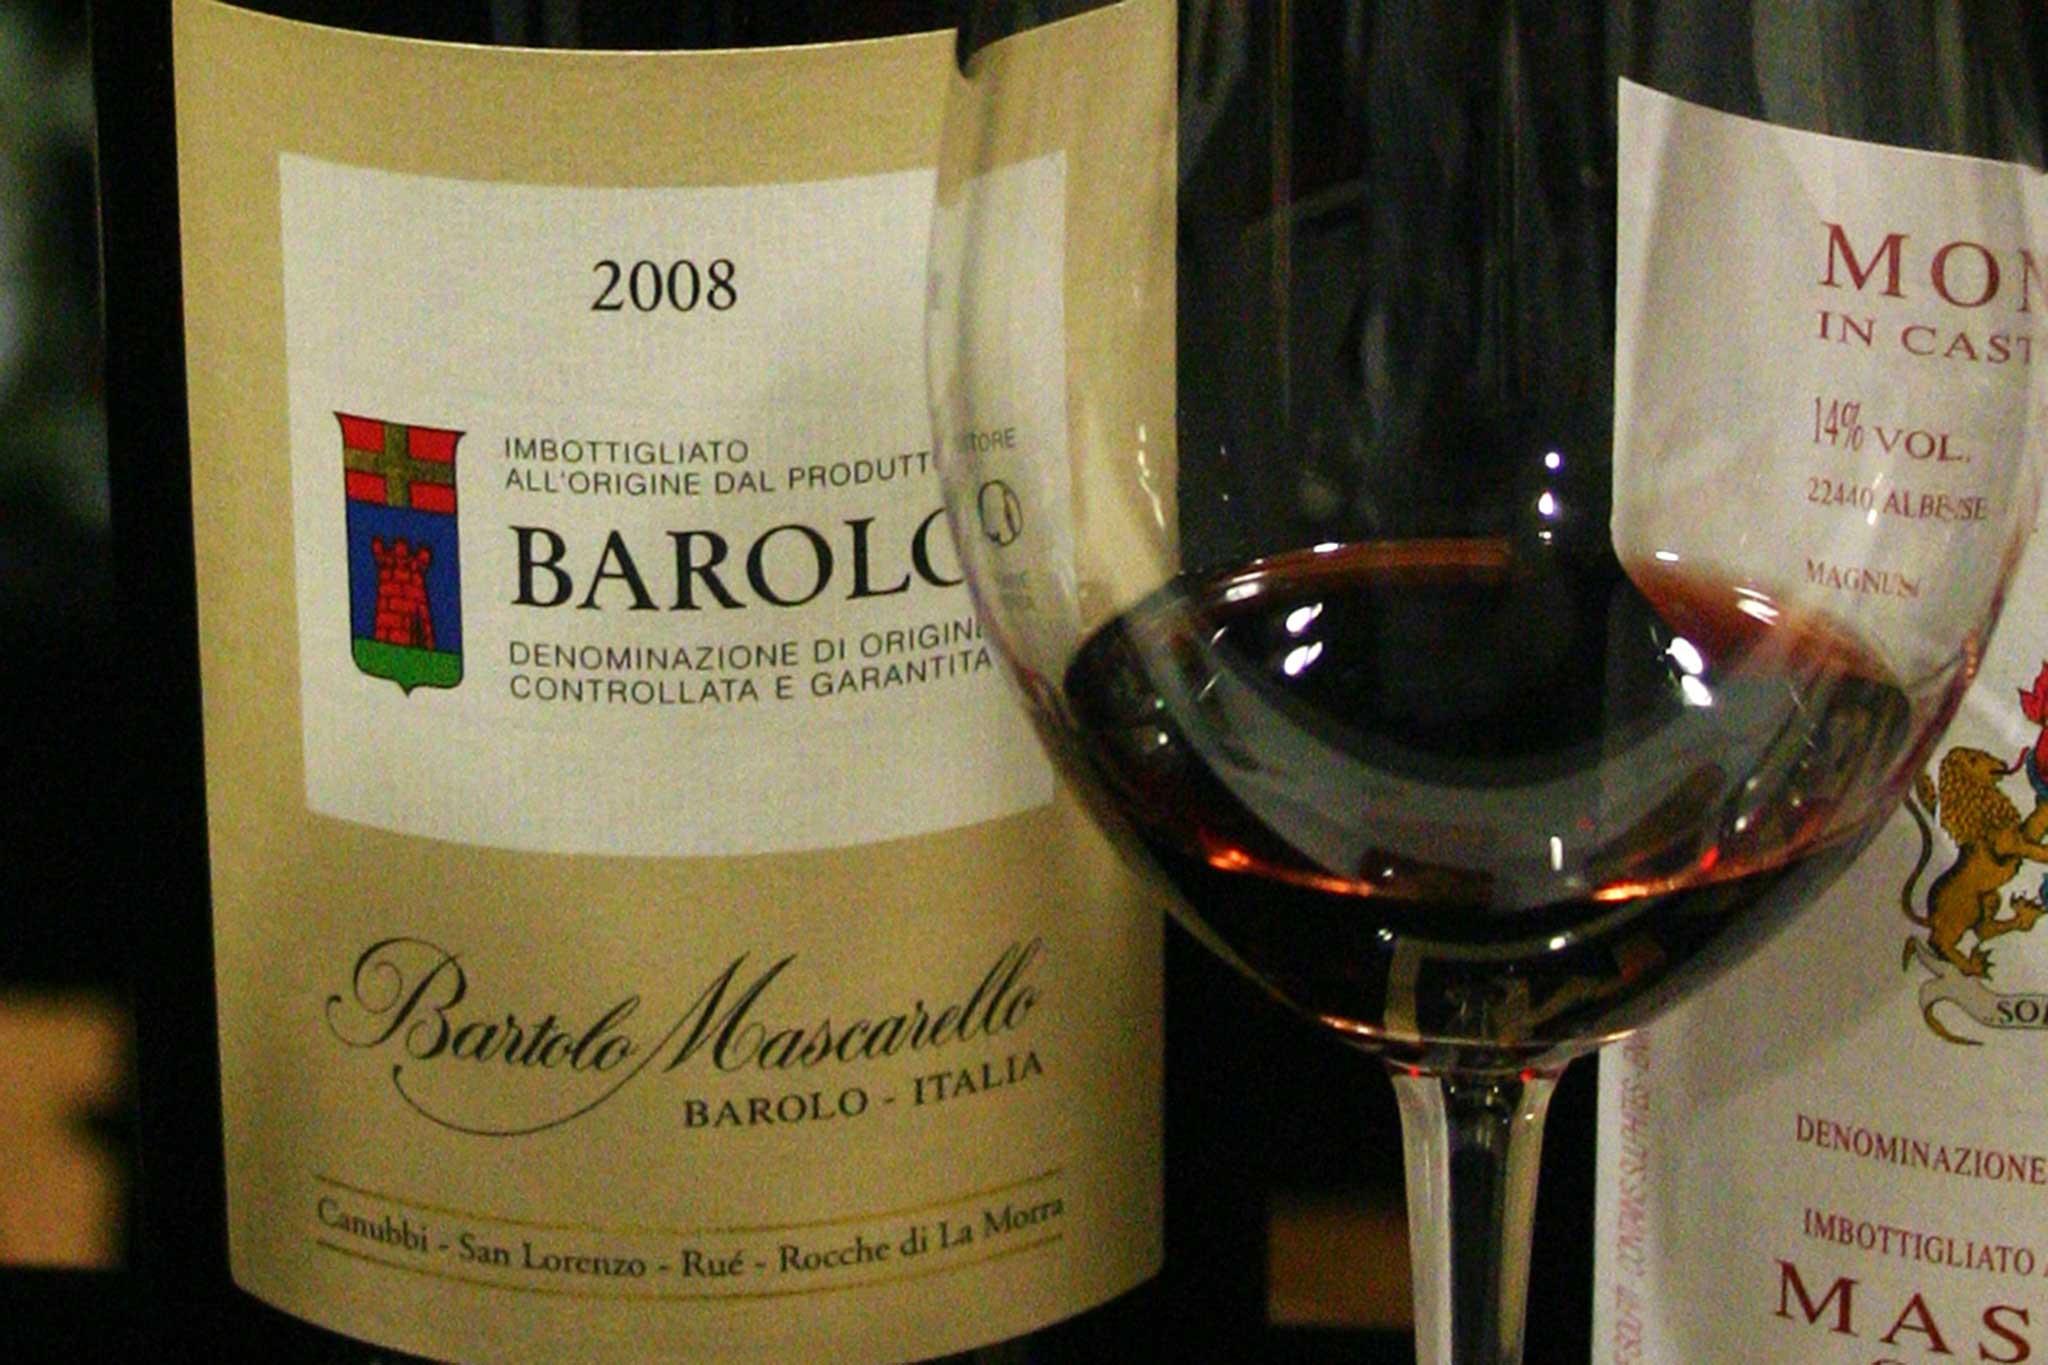 Barolo Bartolo Mascarello